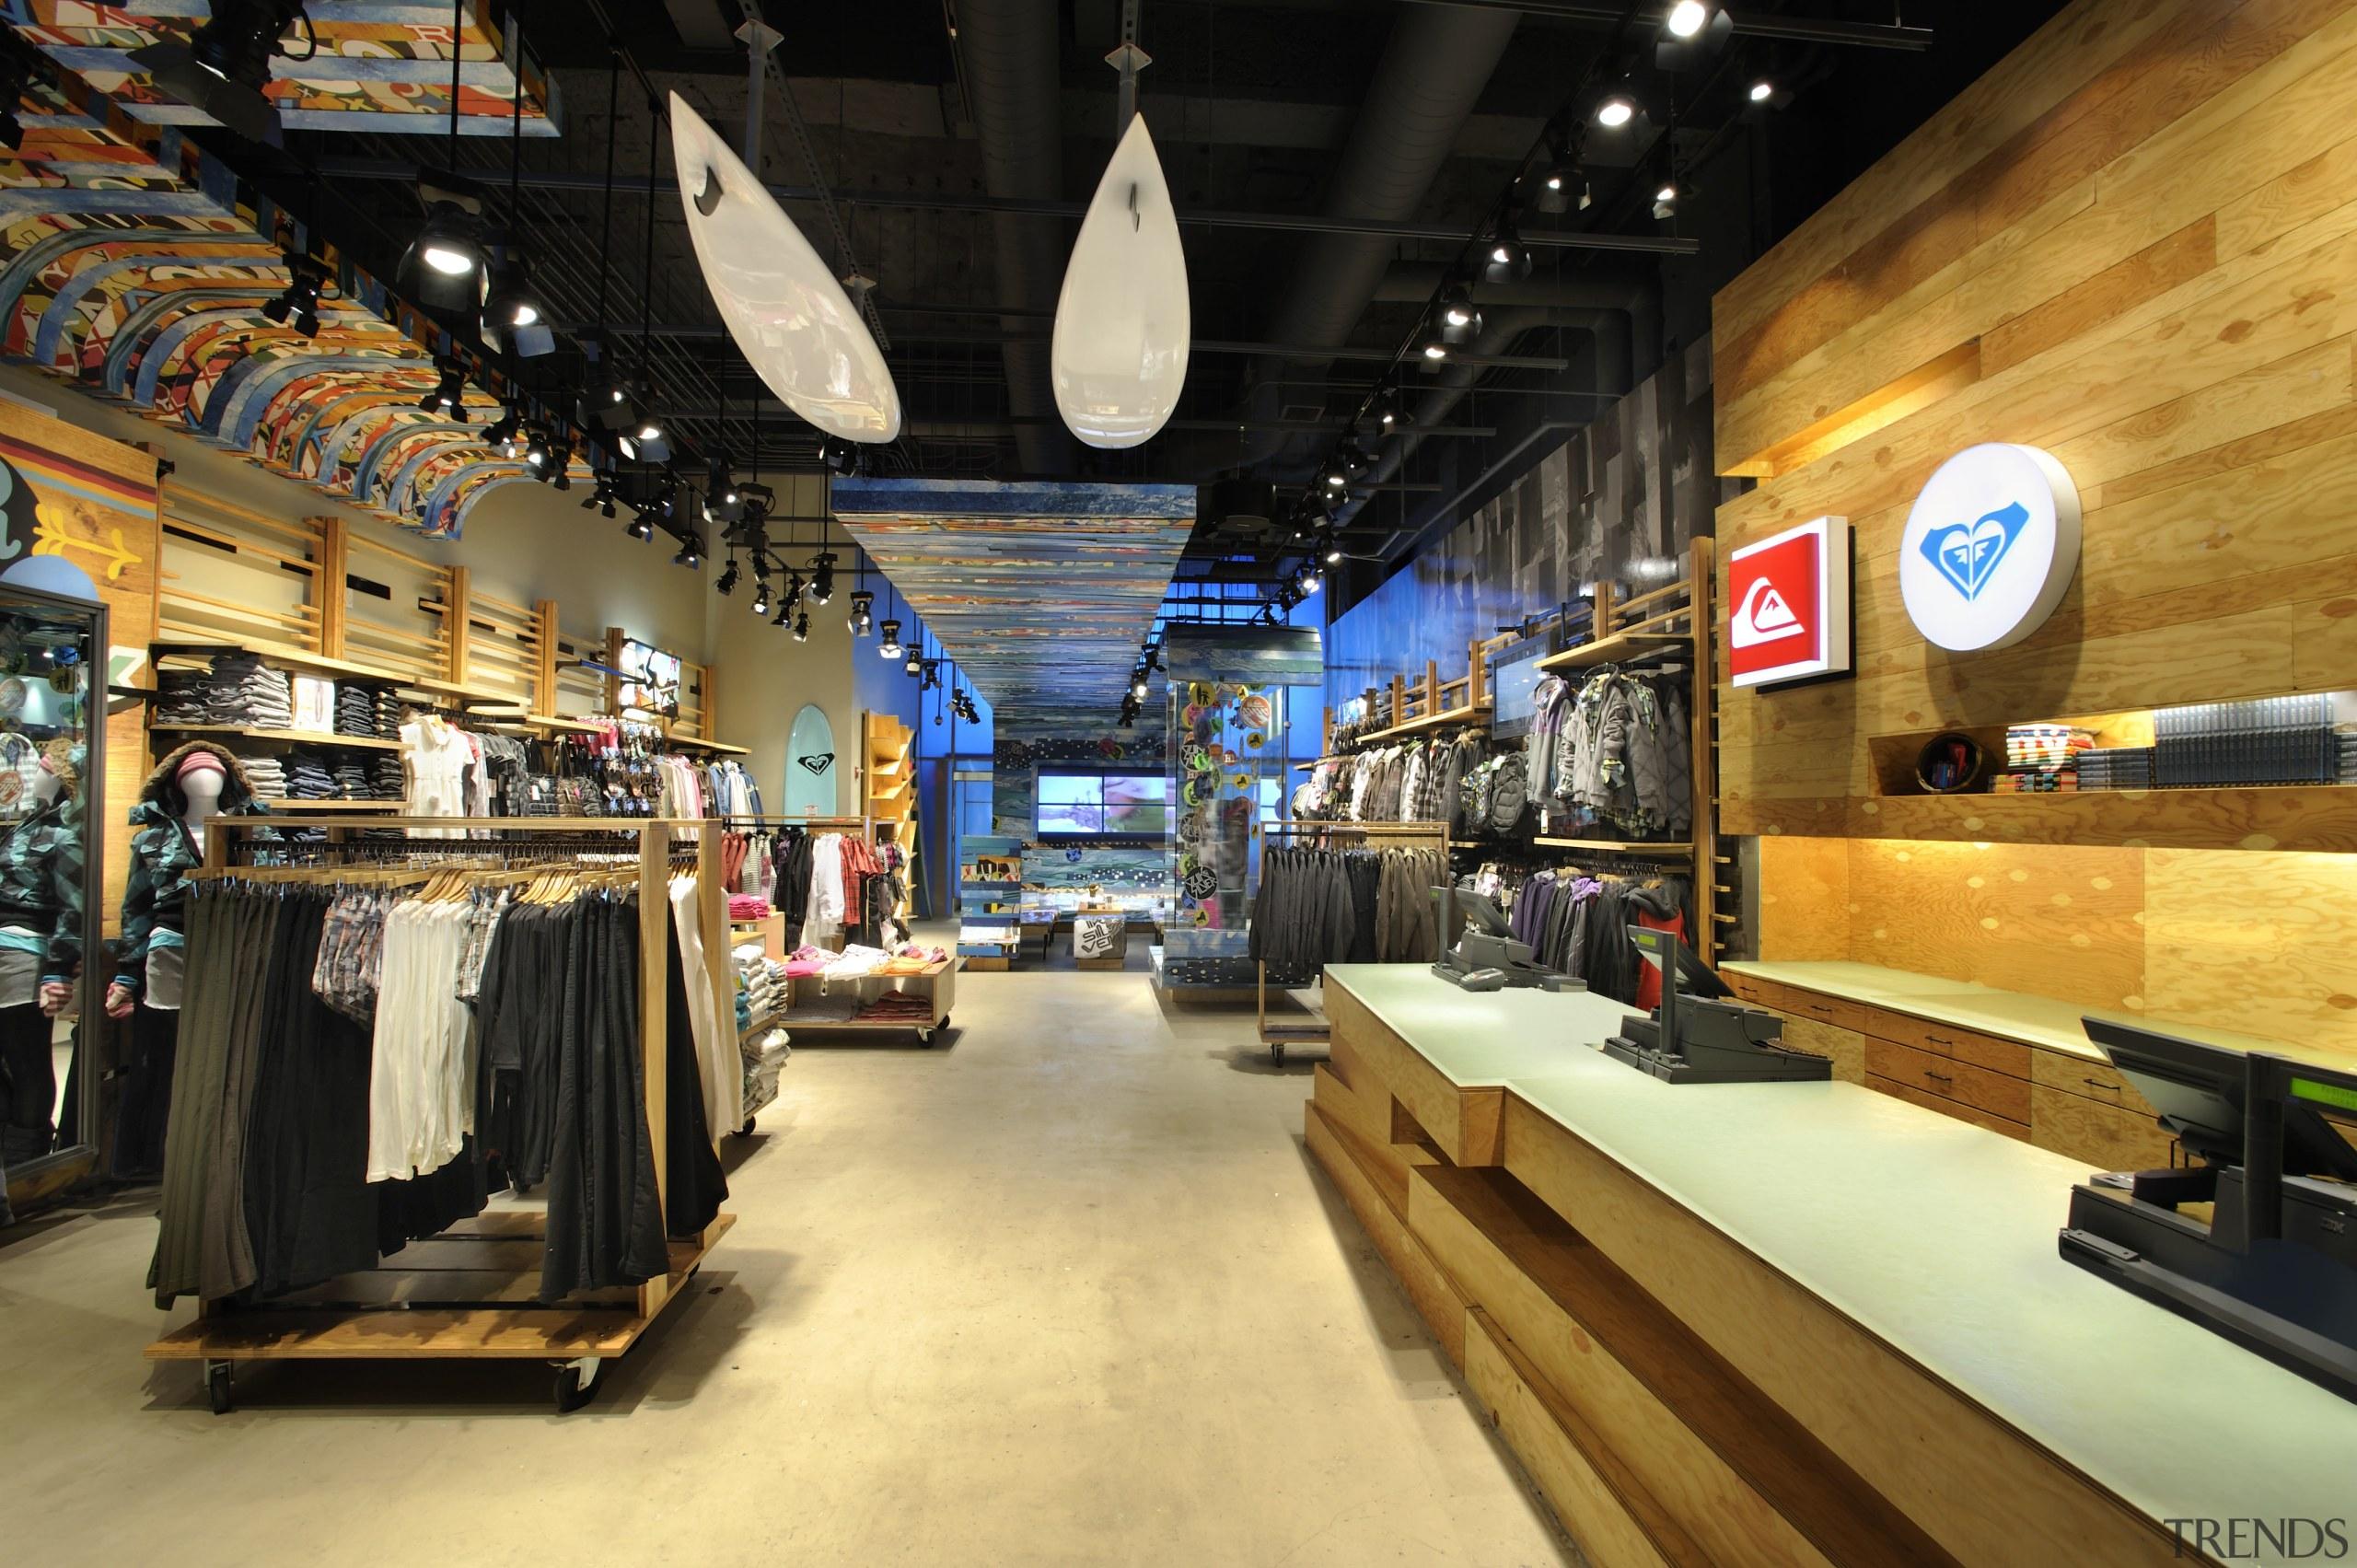 Interior view of the Quicksilver store in New retail, black, orange